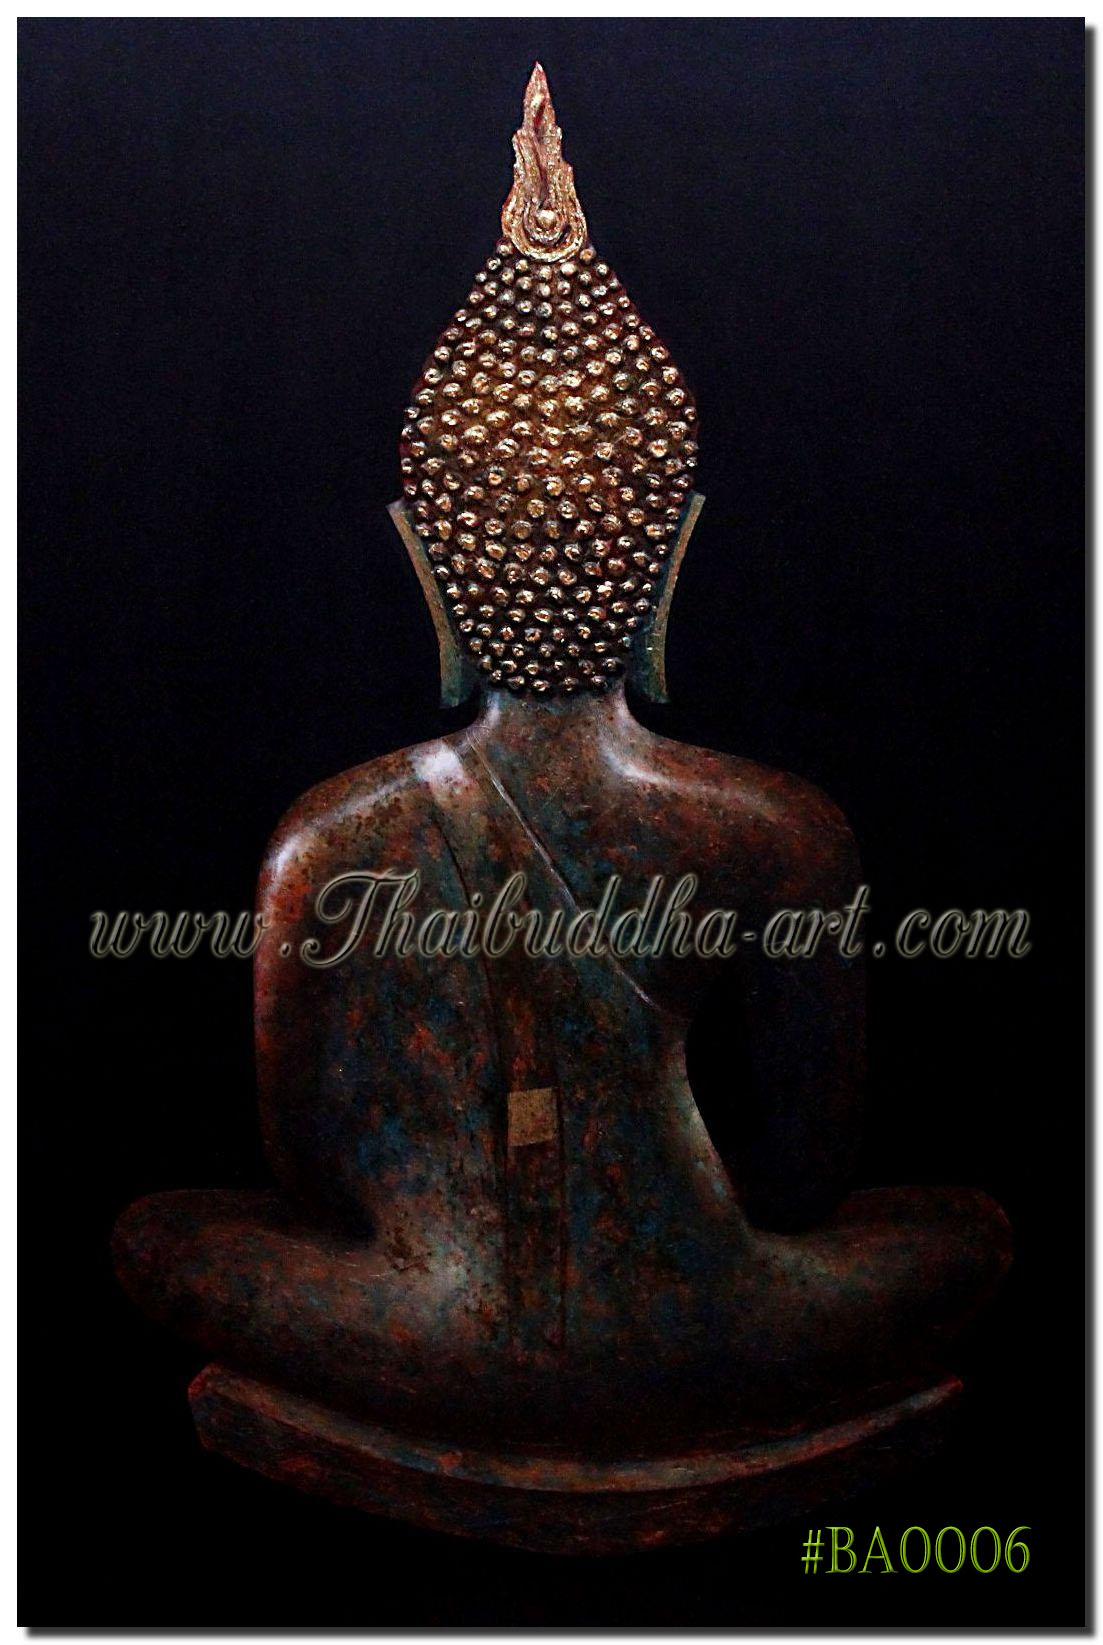 Thaibuddha Art Thai Buddha Painting Ba0006 Thai Buddha